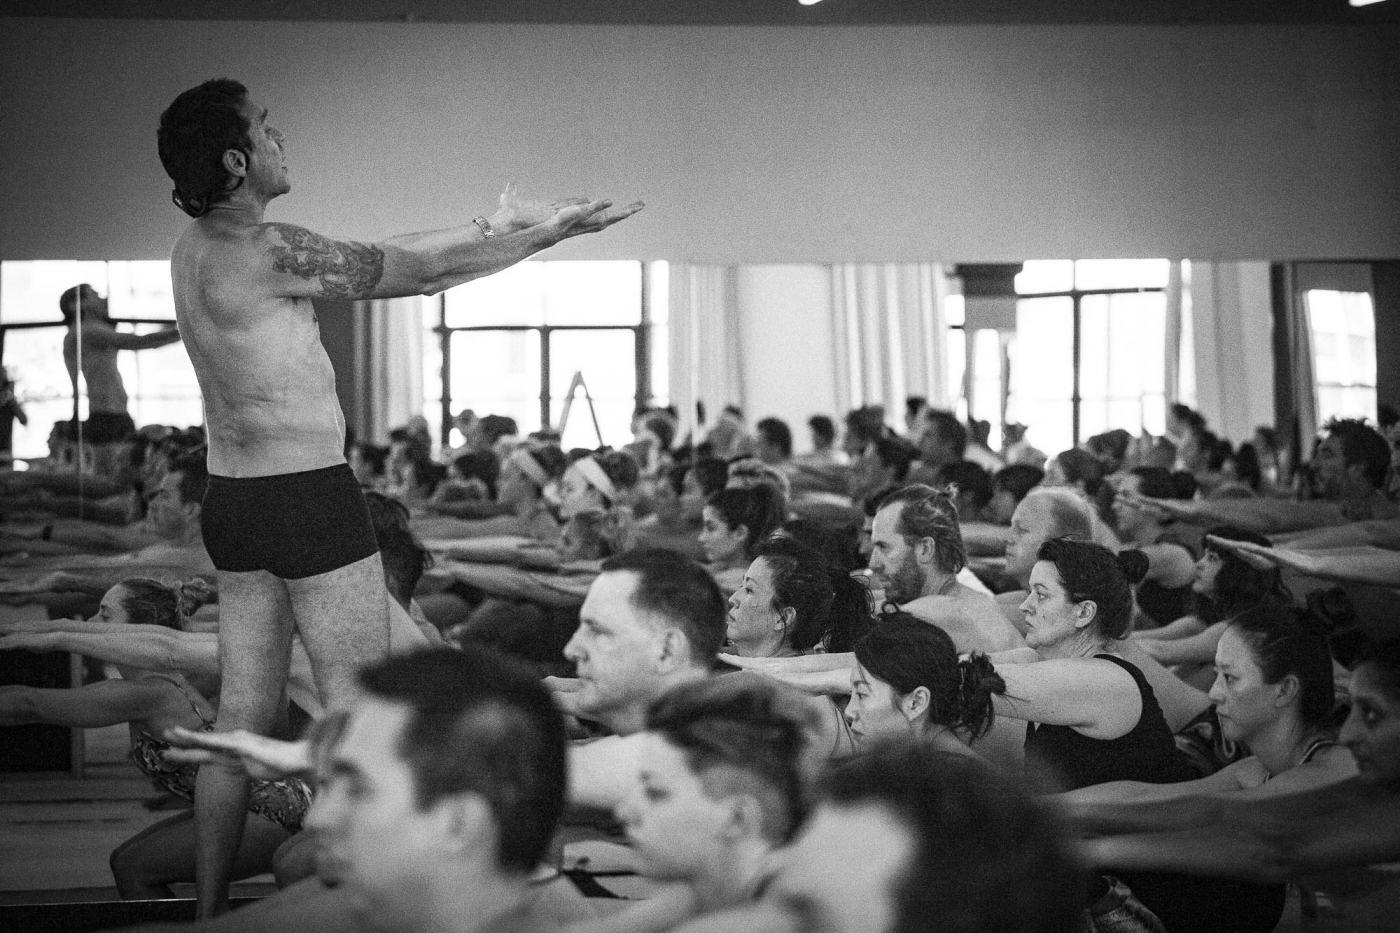 Dazzie conducting the philharmonic yoga class